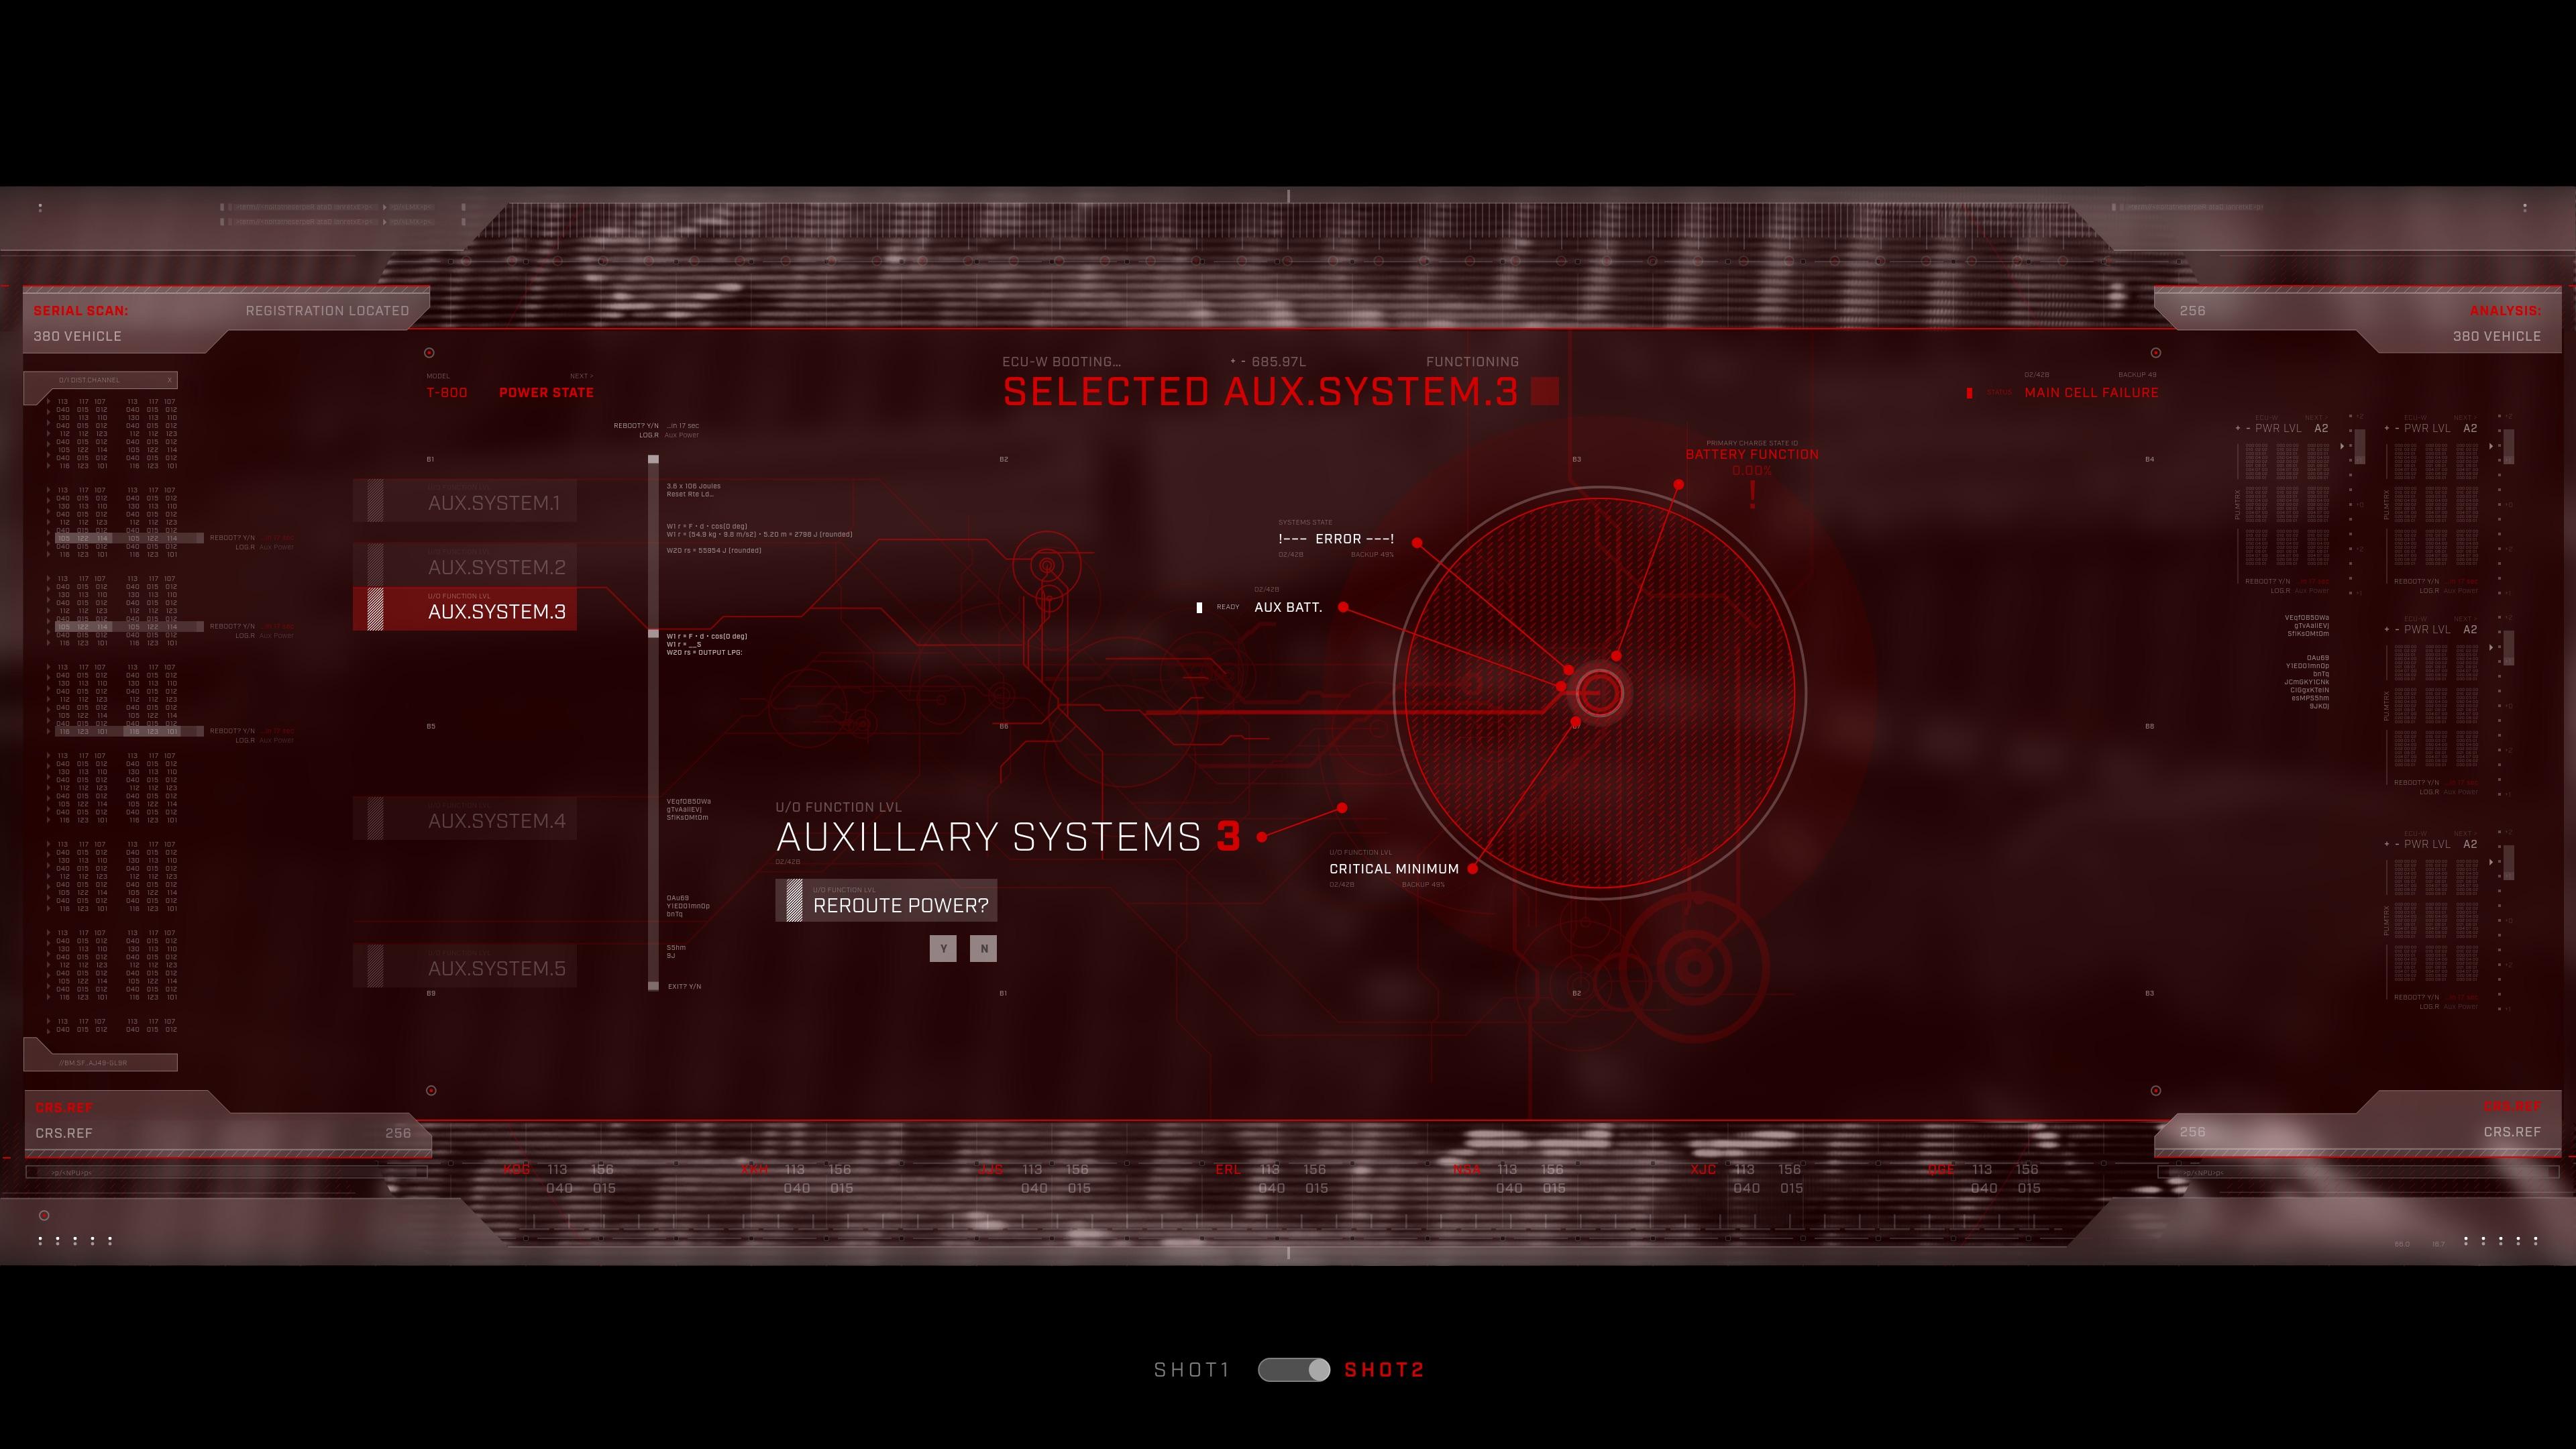 Adobe partners with Territory Studio to release Terminator 2 UI kit